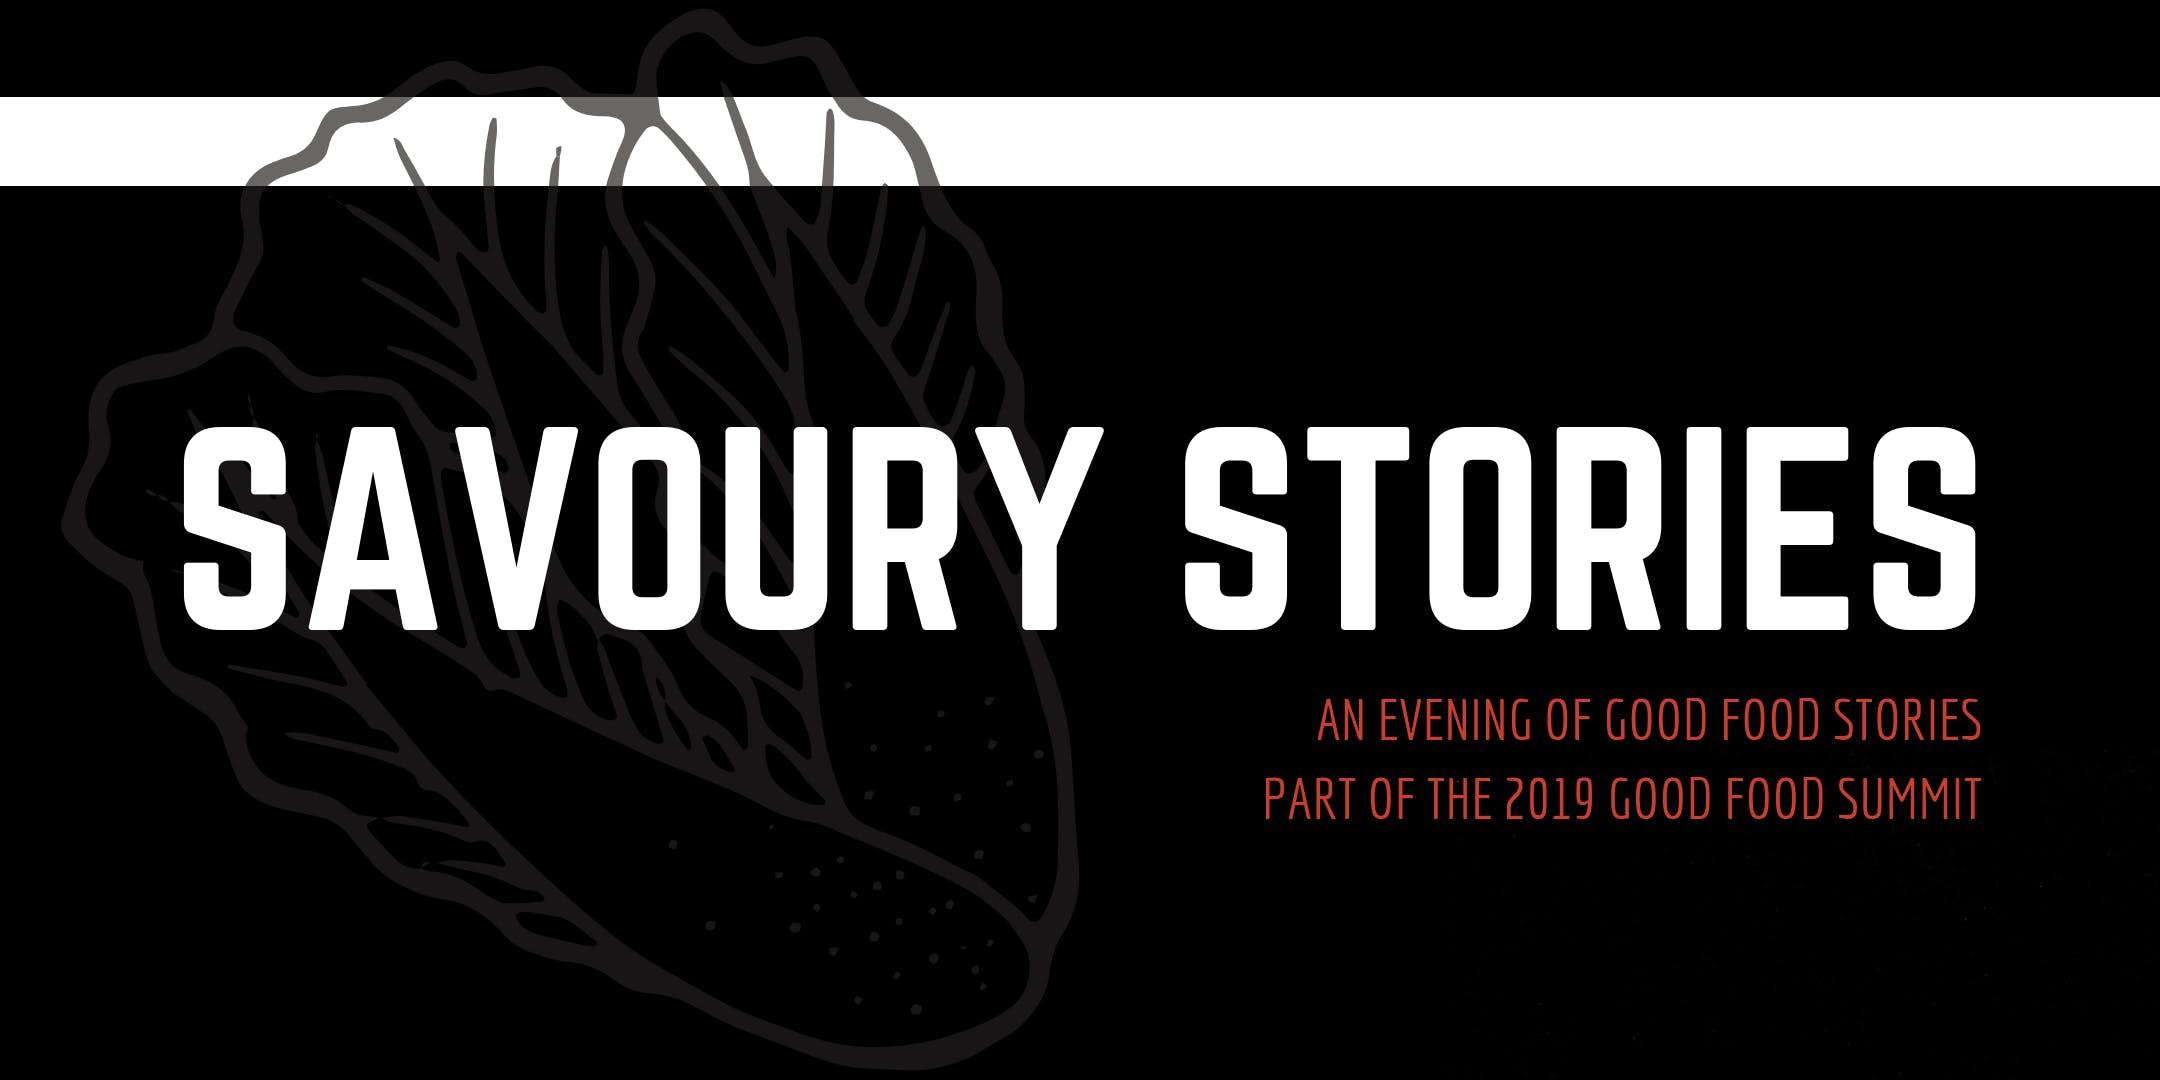 Savoury Stories - 2019 Good Food Summit Launch